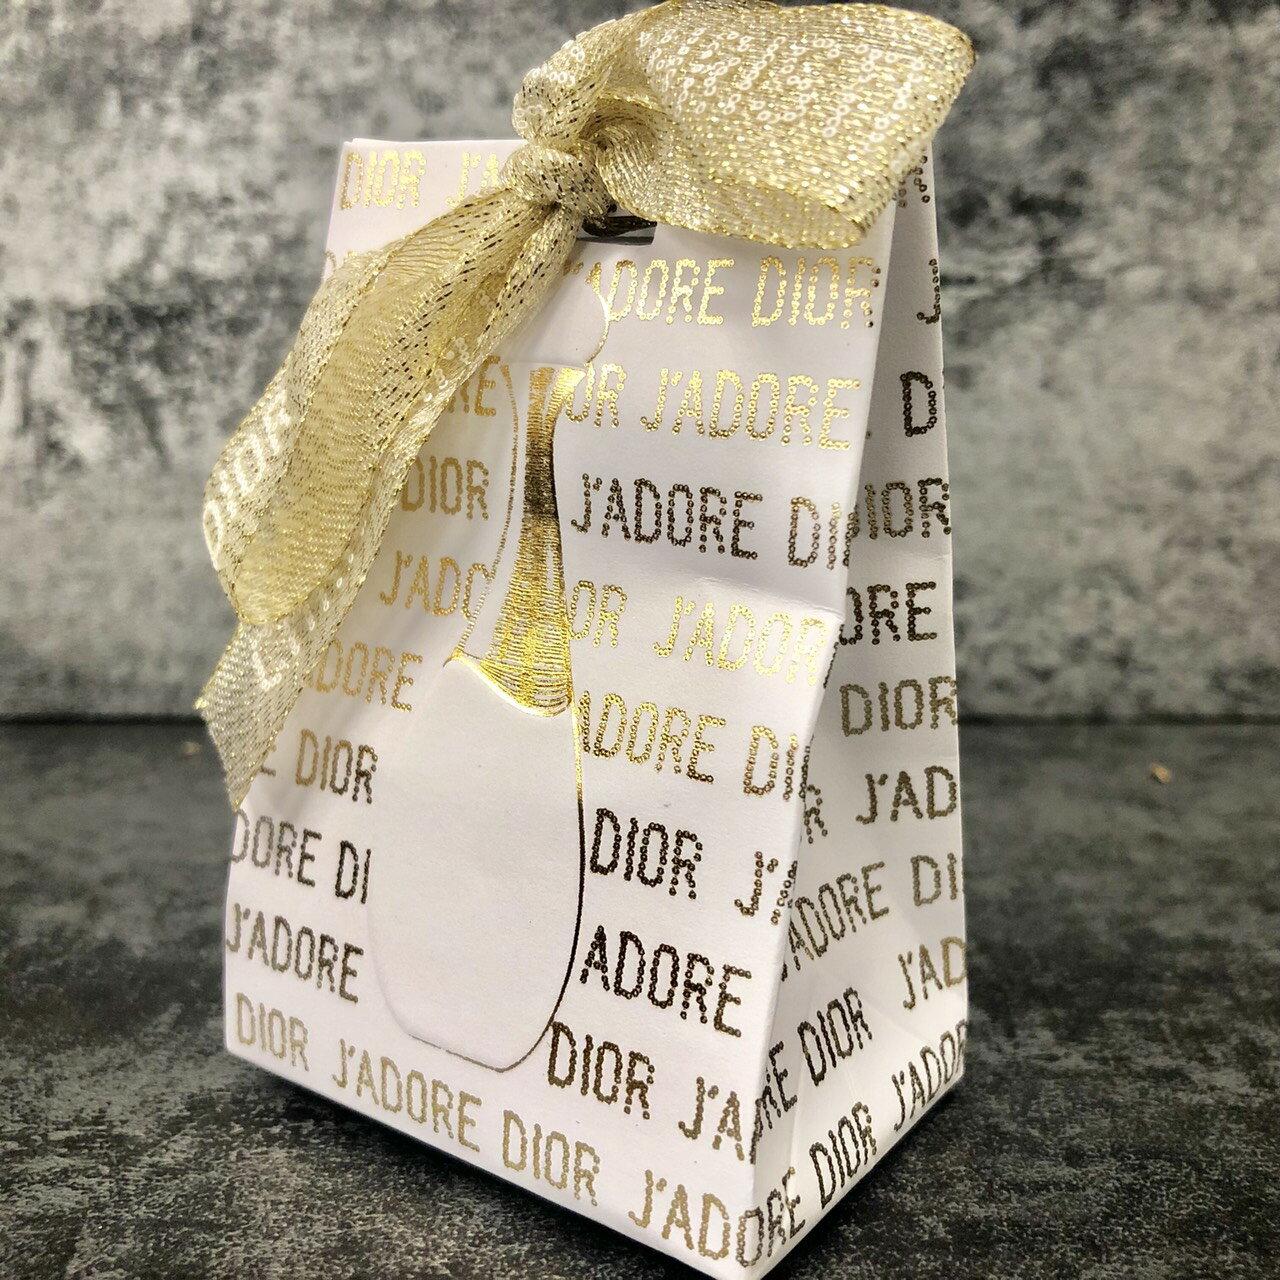 Dior 迪奧 J'adore 金萃香氛禮 5ml香氛◐香水綁馬尾◐ 1